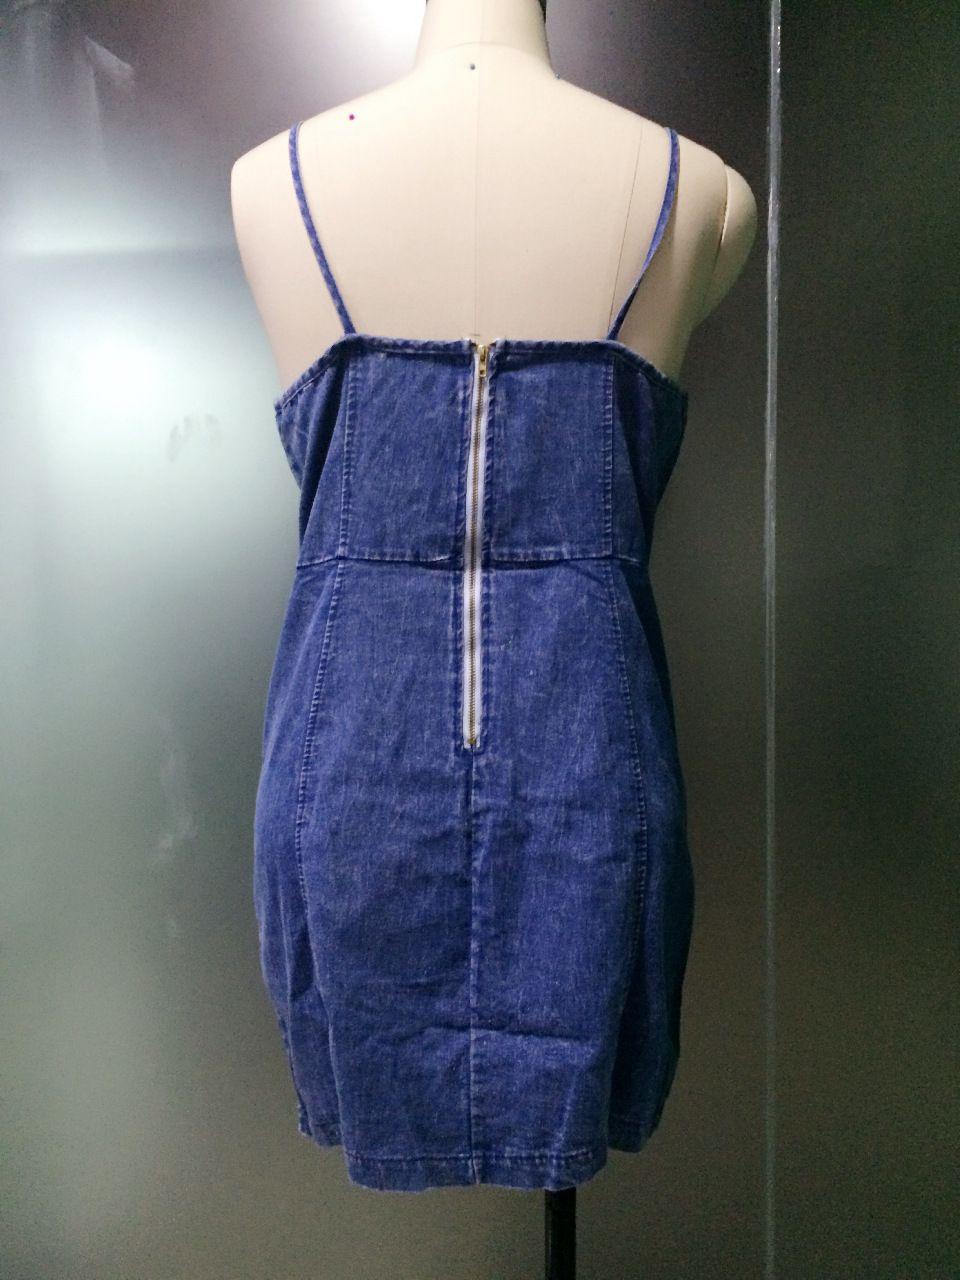 Summer Europe Women Sexy Spaghetti Strap V Neck Backless Zipper Party Denim Jeans Dress Fashion Sleeveless Beach Dress